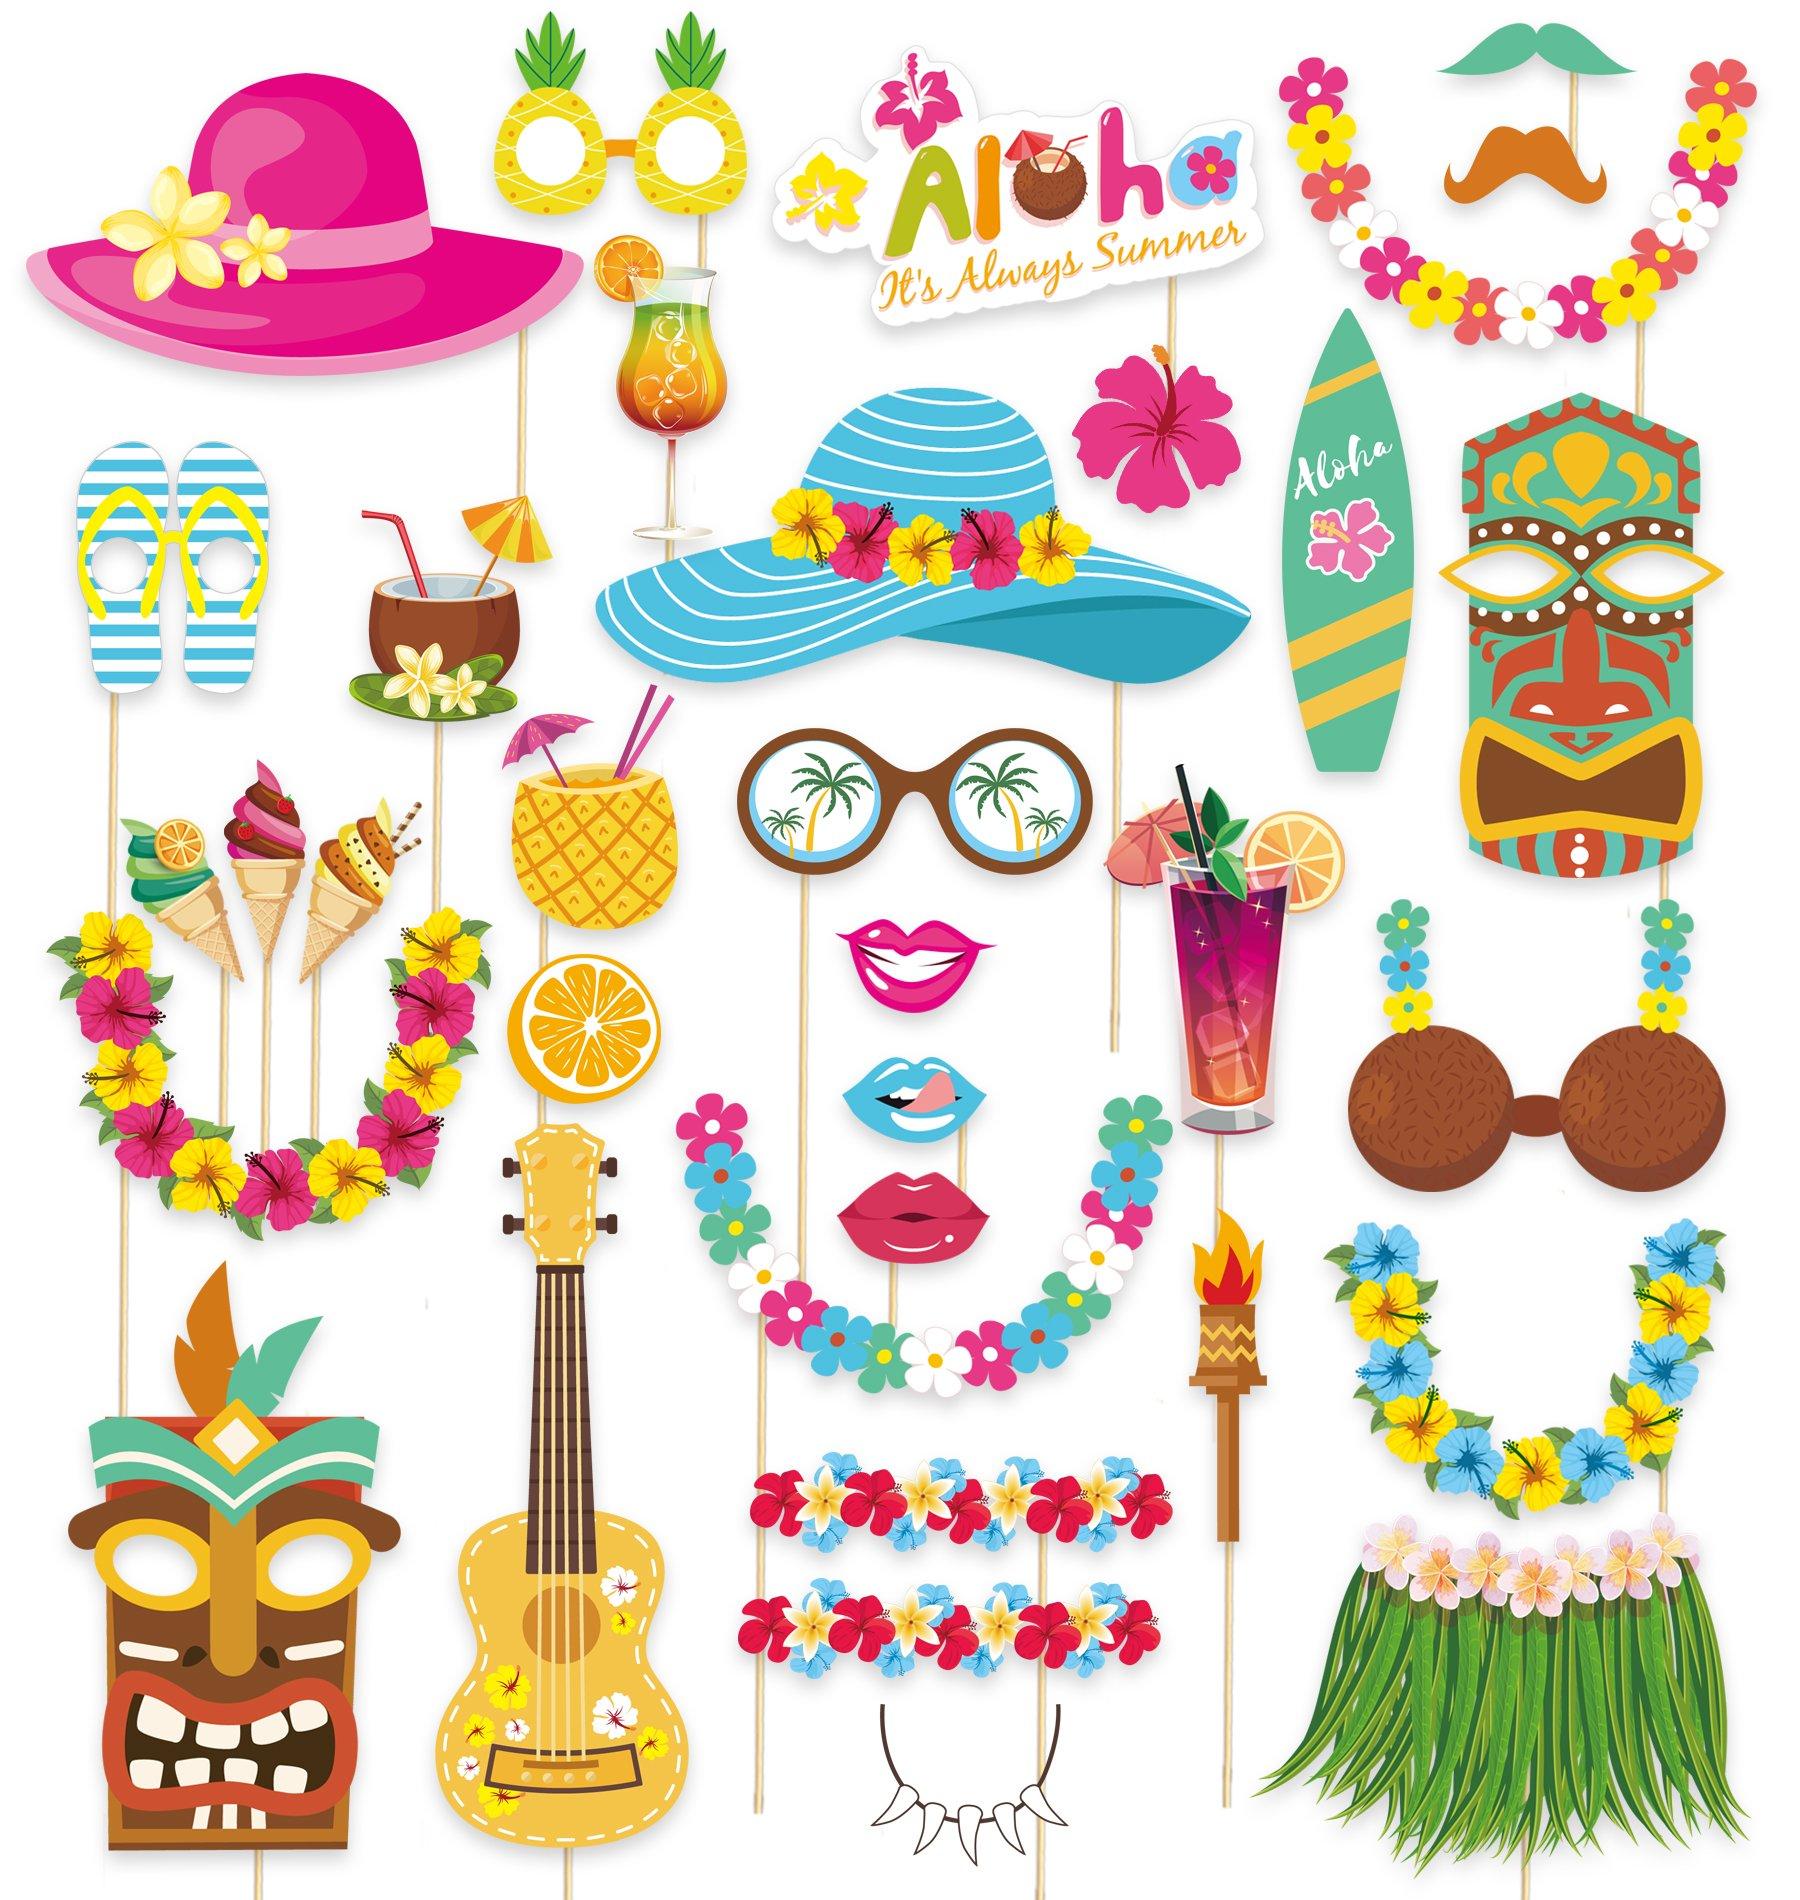 65Ct Luau Hawaiian Photo Booth Props - Beach Tropical Tiki Summer Party Decorations Supplies